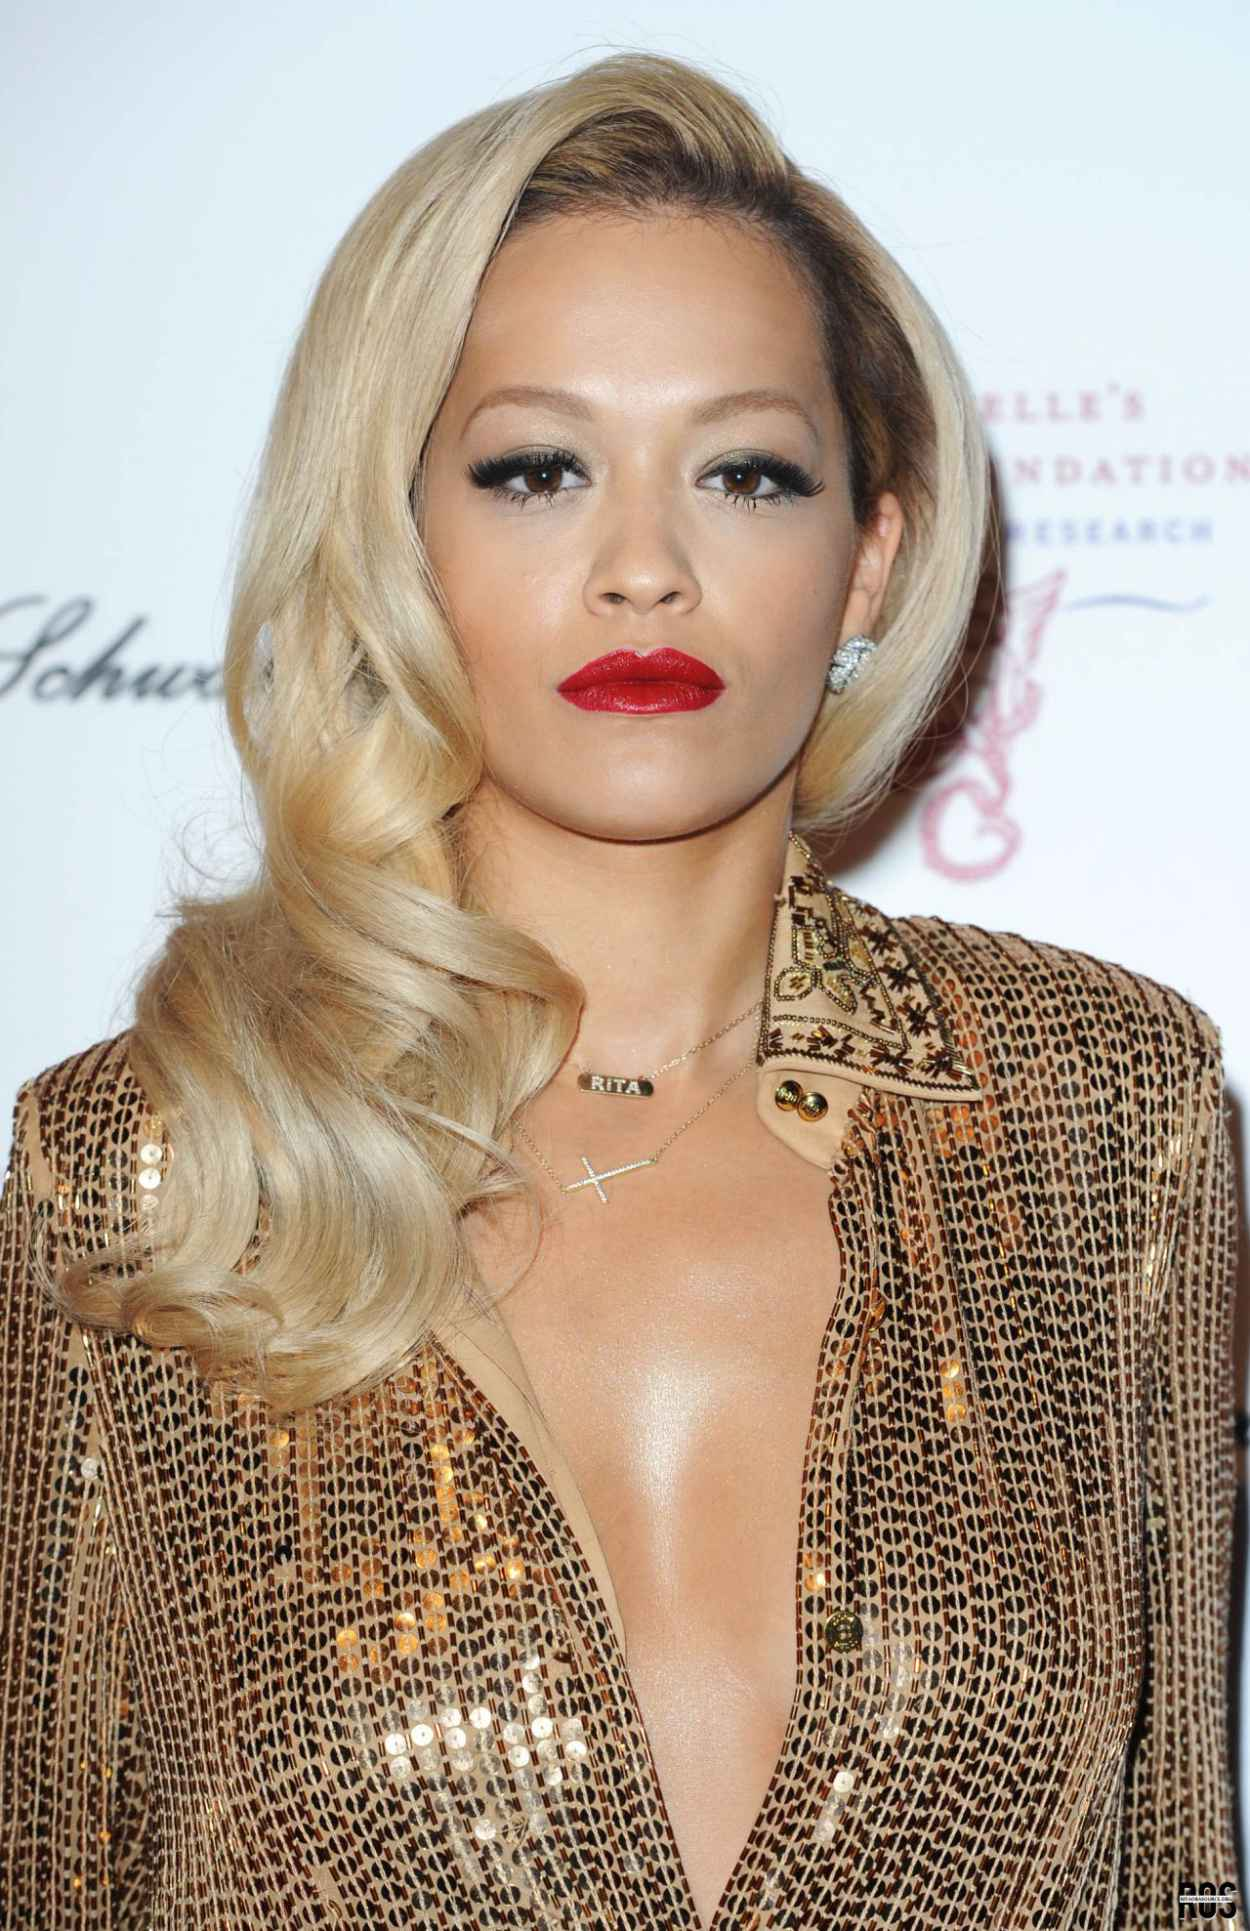 Rita Ora Wearing Emilio Pucci Floor-Length Dress - 2015 Gabrielles Gala in London-1